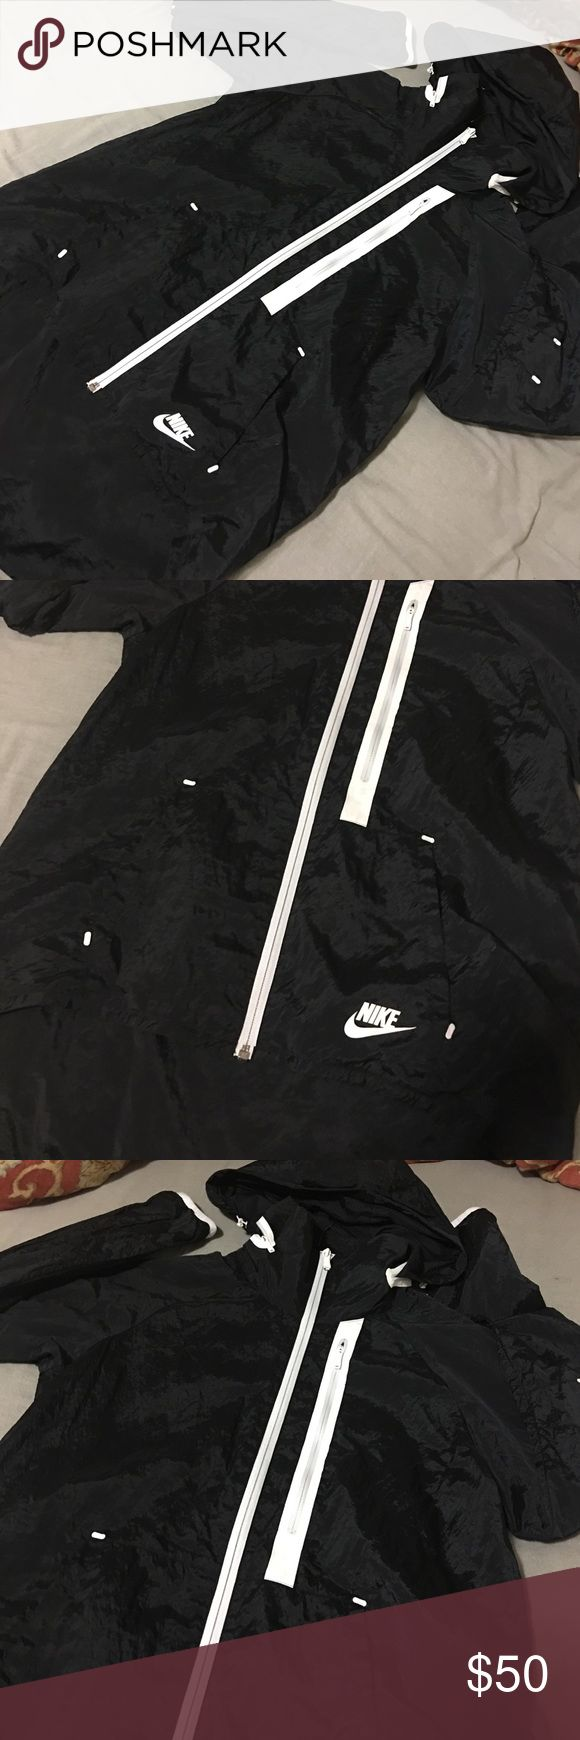 Nike Women's windbreaker zip up hoodie Worn only handful of times Nike Jackets & Coats Utility Jackets